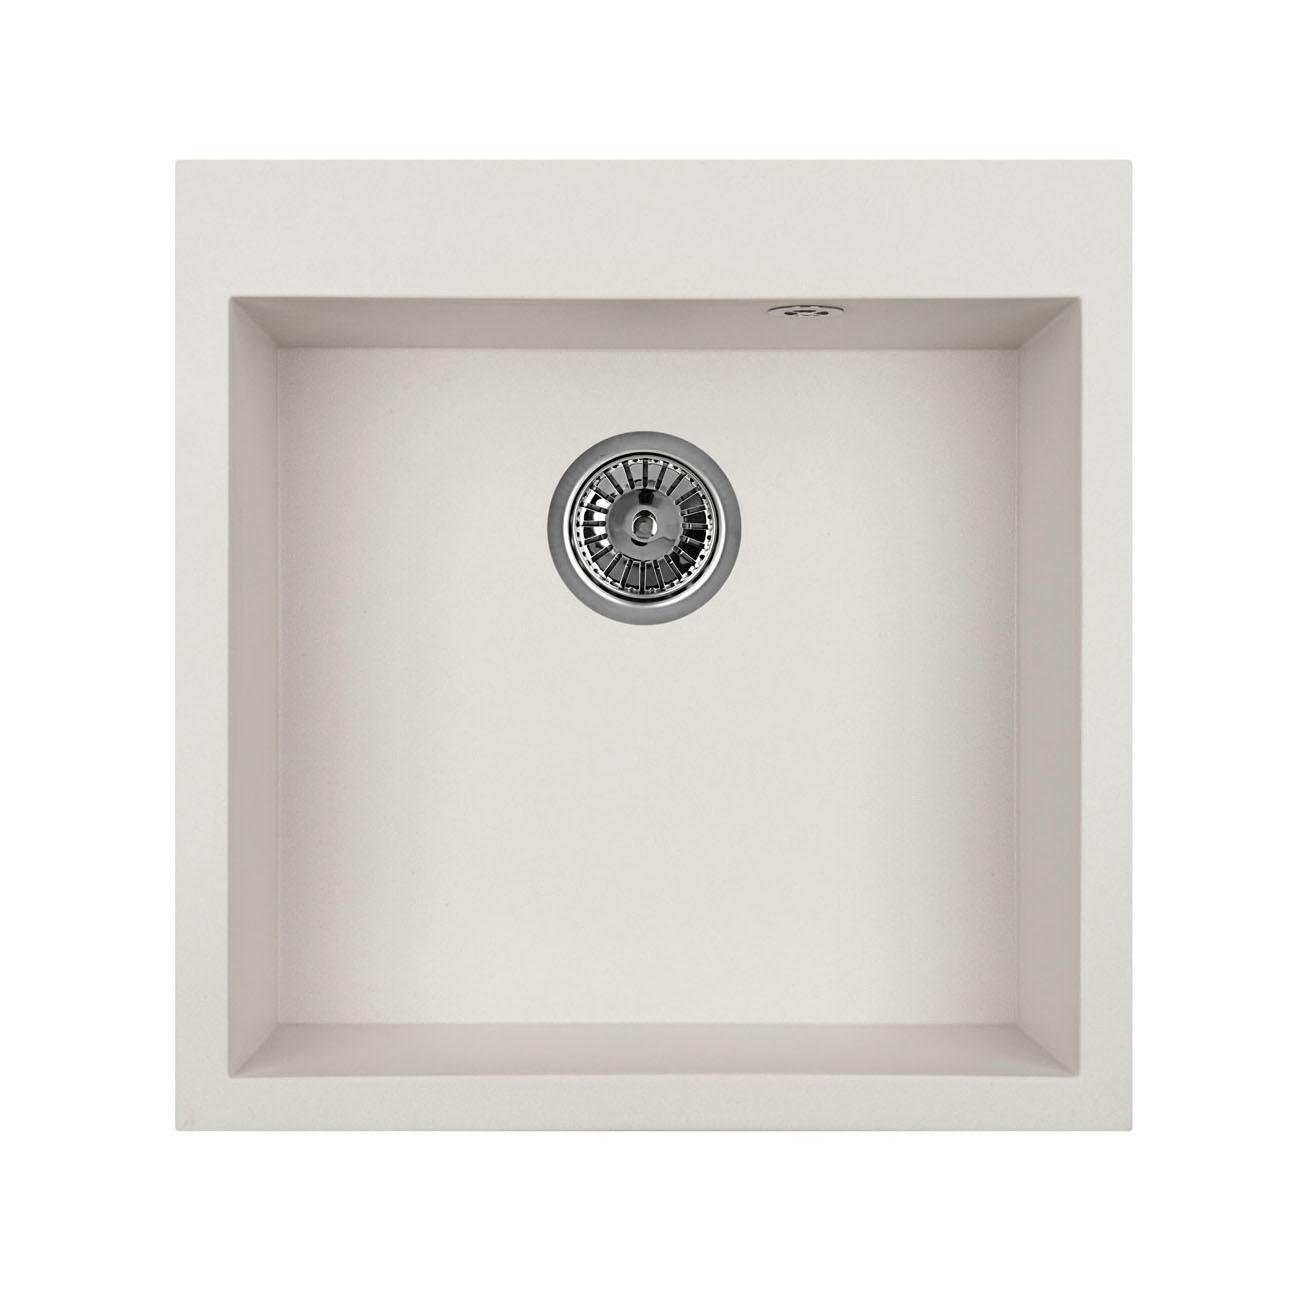 Кухонная мойка Granula GR-5102 505х510 арктик nordfolk nap 5102 white